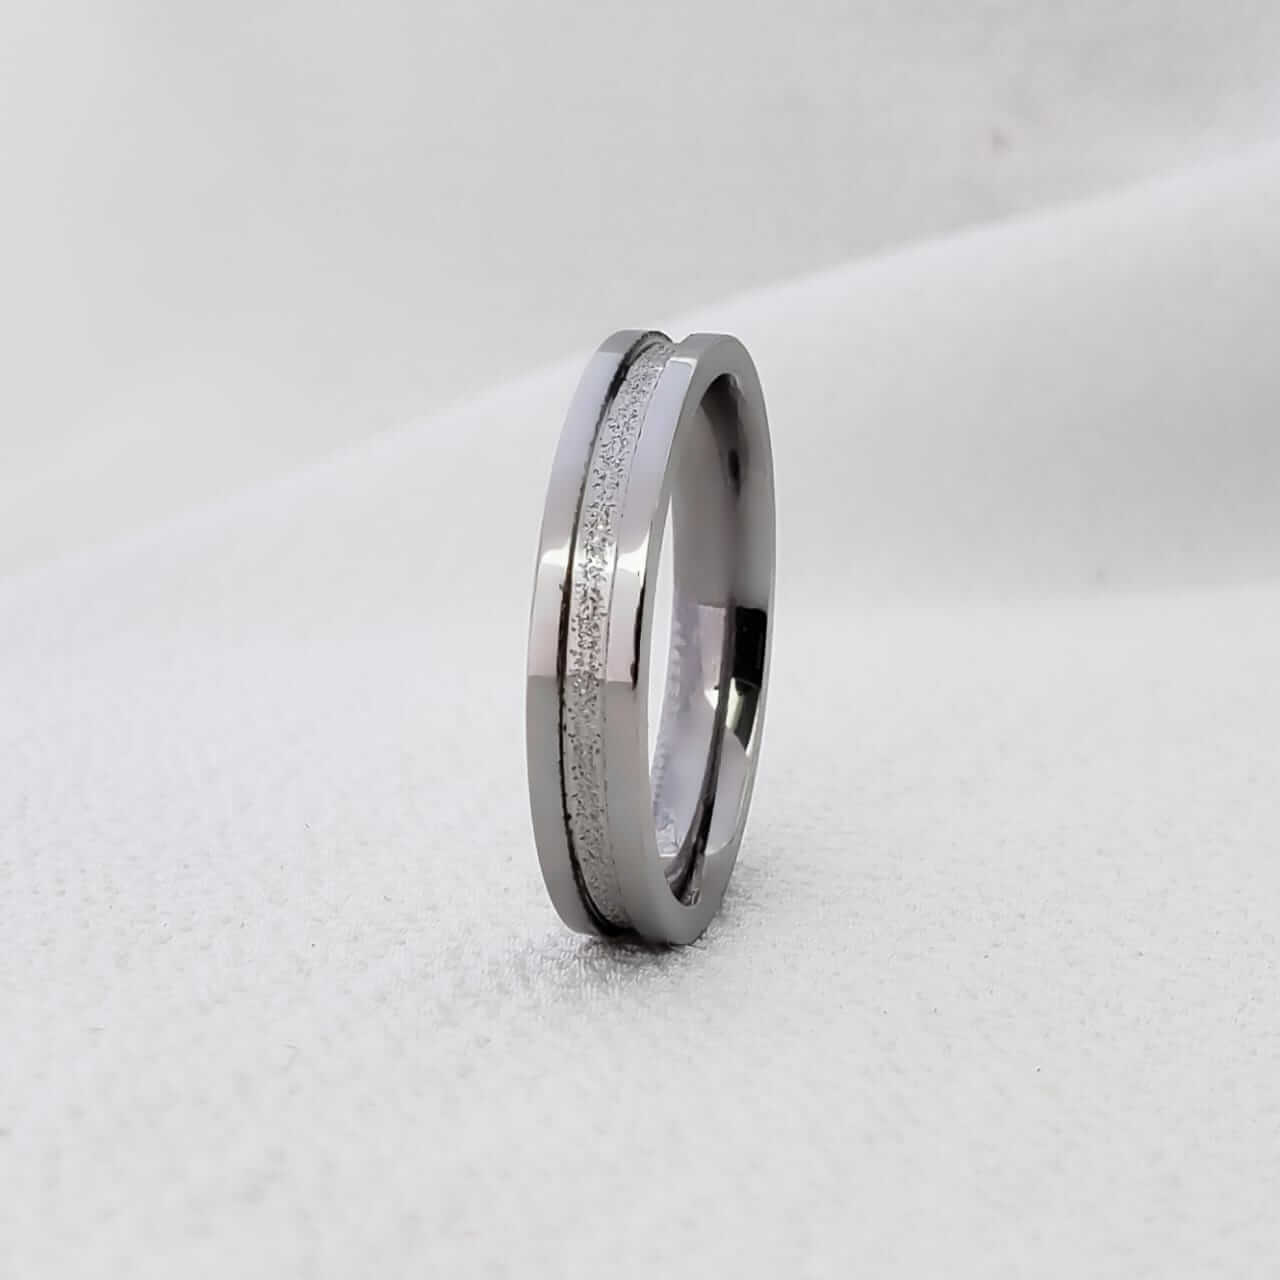 Aliança Jasmine 240 em Aço Inox 4mm (Masculina)